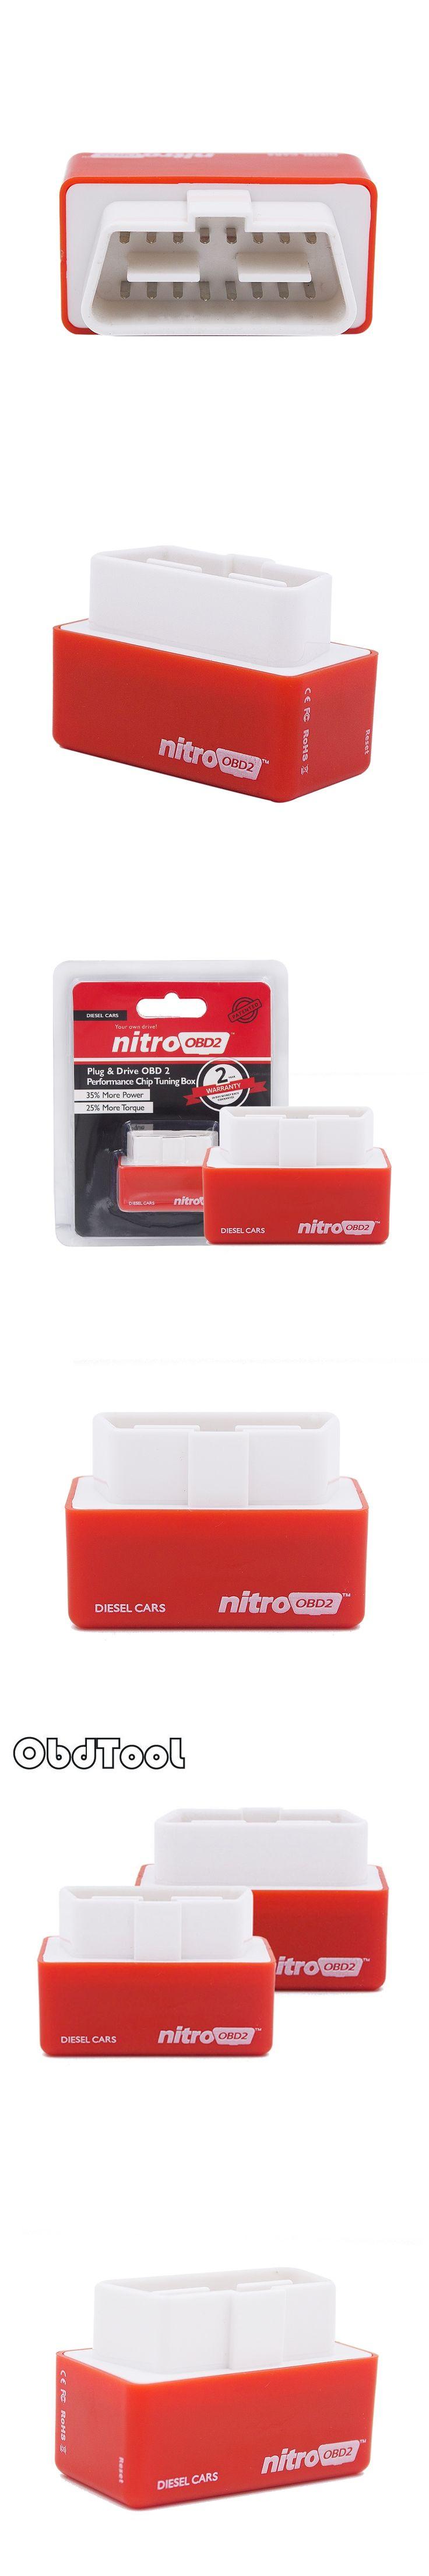 2016 Best Nitro OBD2 Chip Tuning Box More Power & Torque NitroOBD2 Nitro For Diesel Car Nitro OBD Plug & Drive Retailing Box